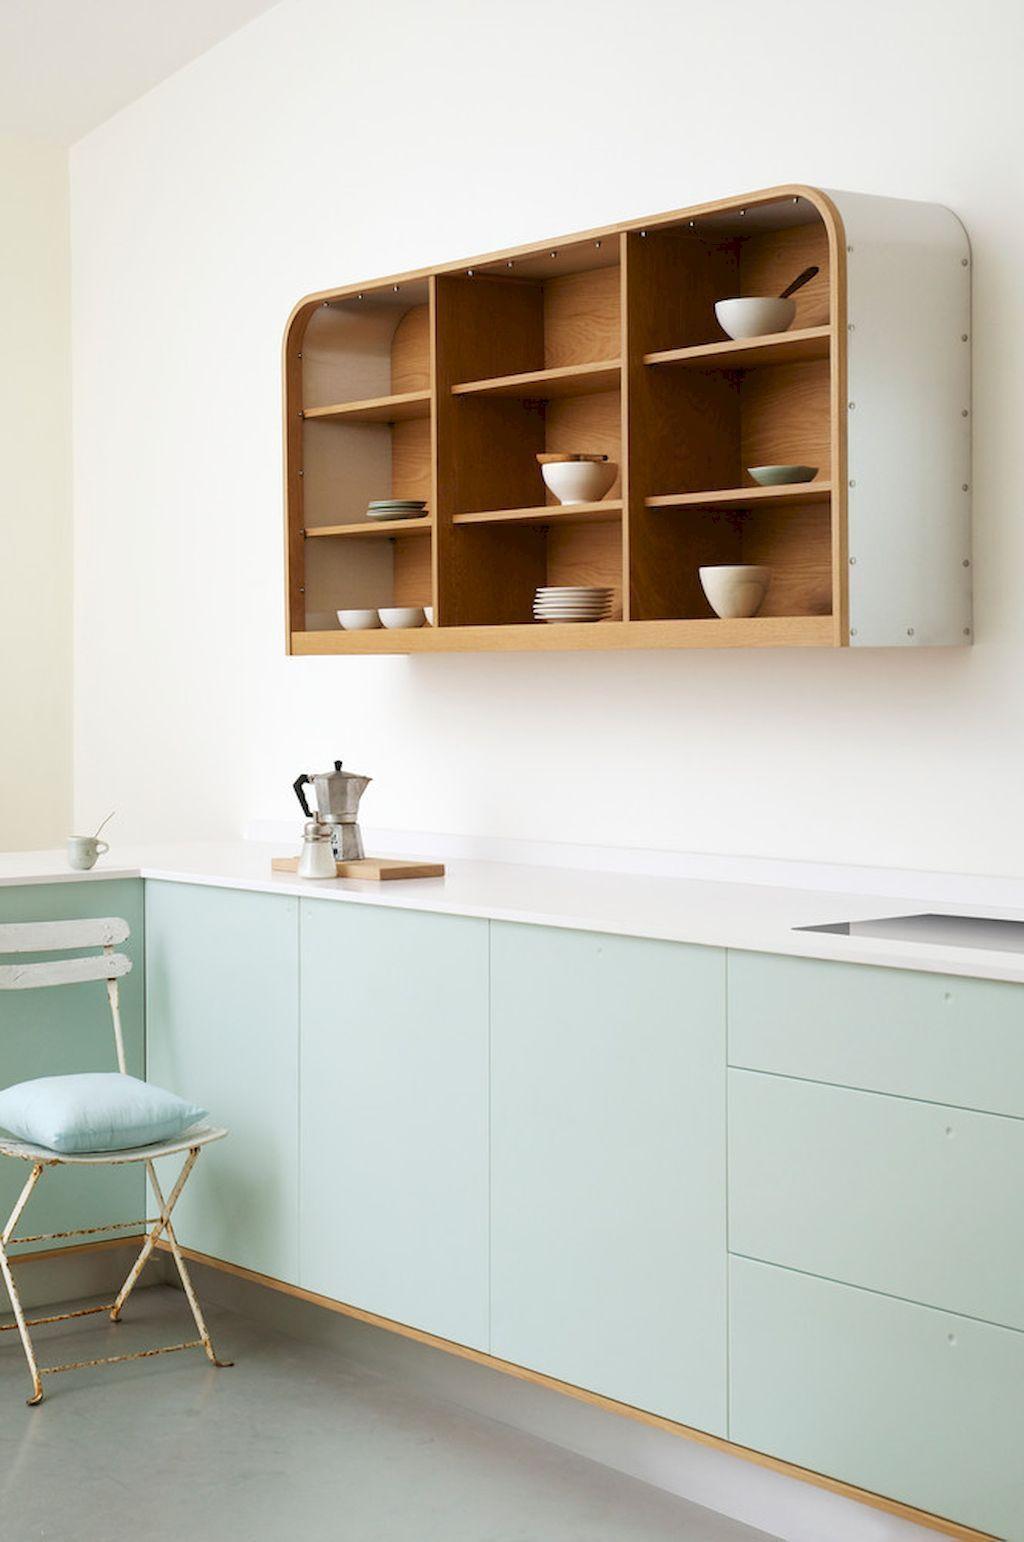 World Nakif Scandinavian Kitchen Design Minimalist Kitchen Scandinavian Cabinets